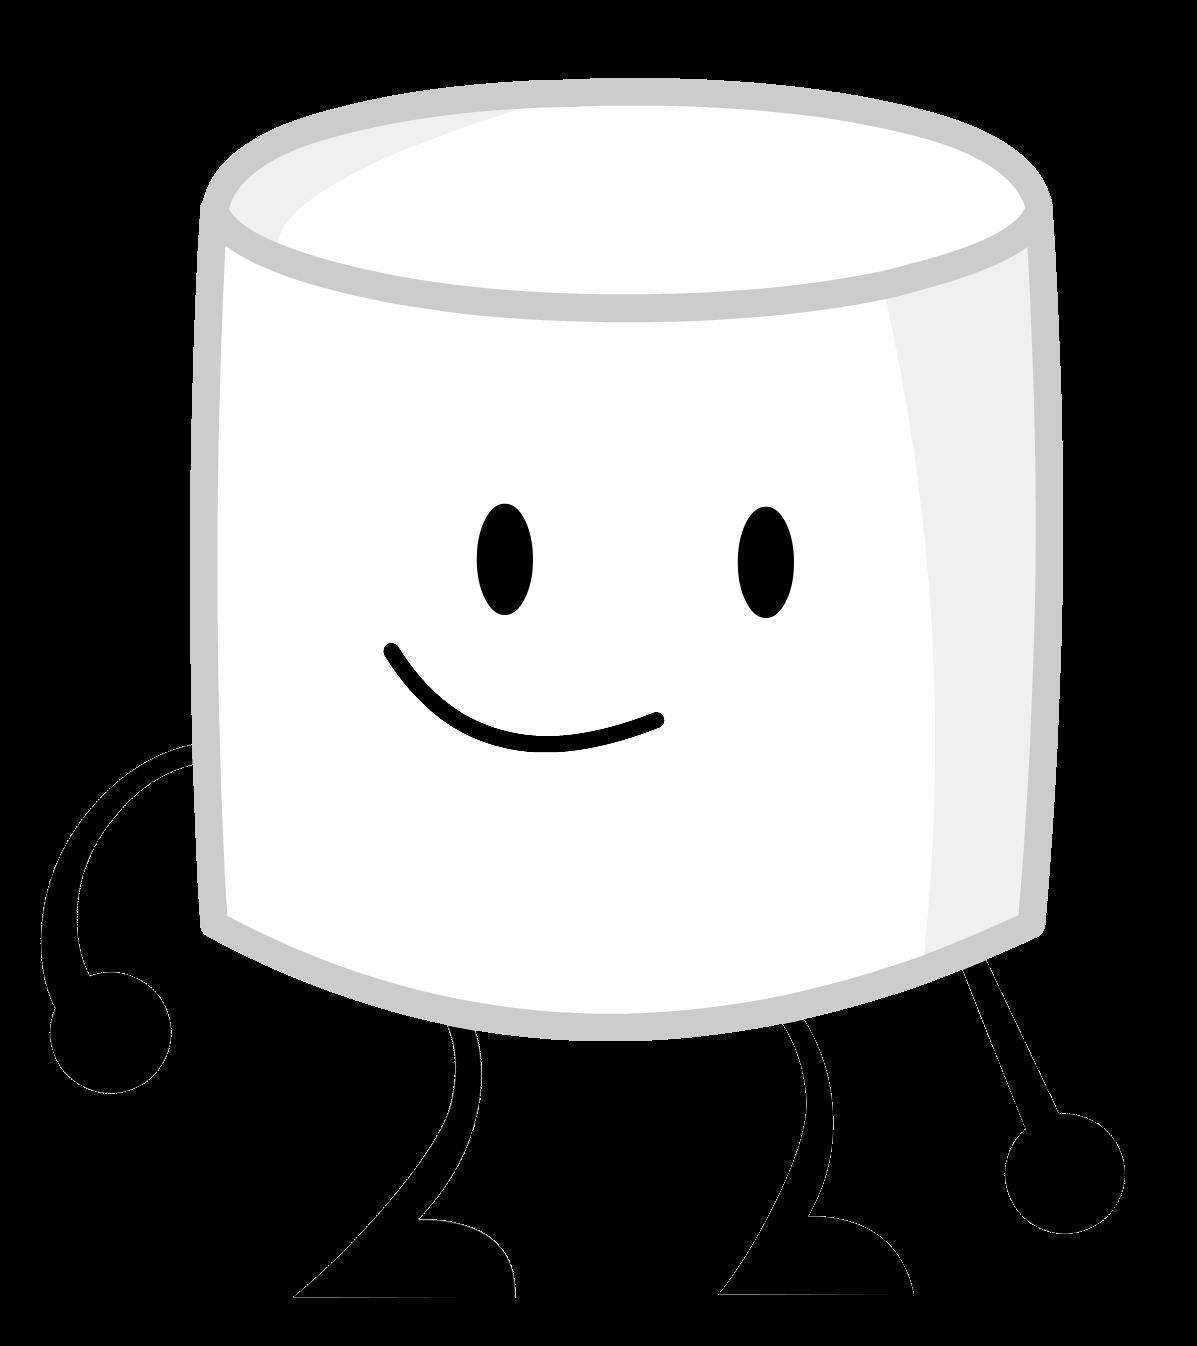 Marshmallow clipart bucket. Image marshmallowpose png inanimate